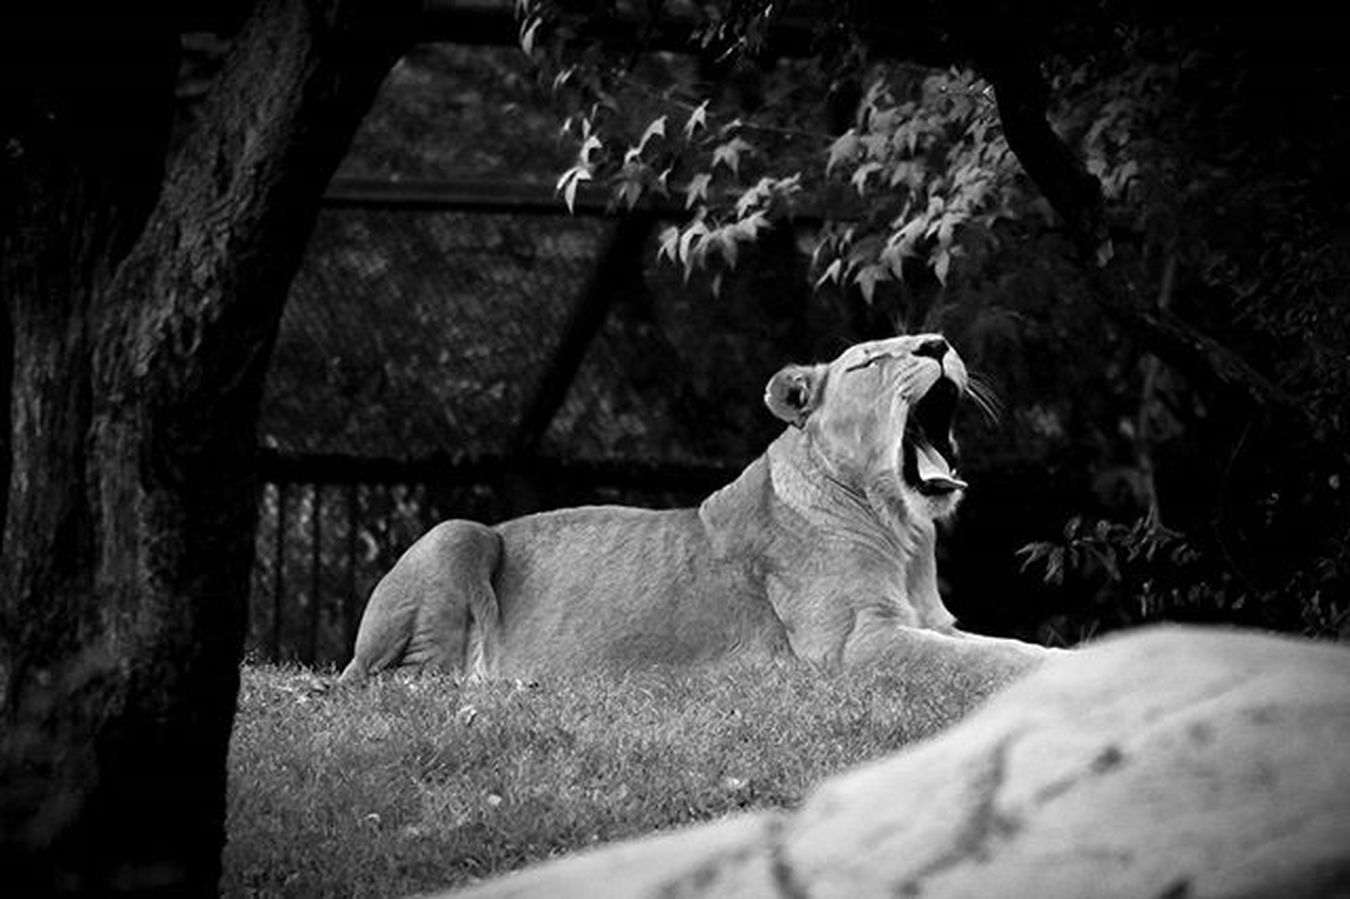 The Lion Mextagram Mexigers Instagram Instagramers Hallazgosemanal VSCO Vsvocam Canont3 CanonMexicana Canon_official Igersdf Igersmexico Igersmex Instagood Comunityfirst Primerolacomunidad Blackandwhite Blancoynegro Bnw VSCOBlack Mextagram_ojoscerrados